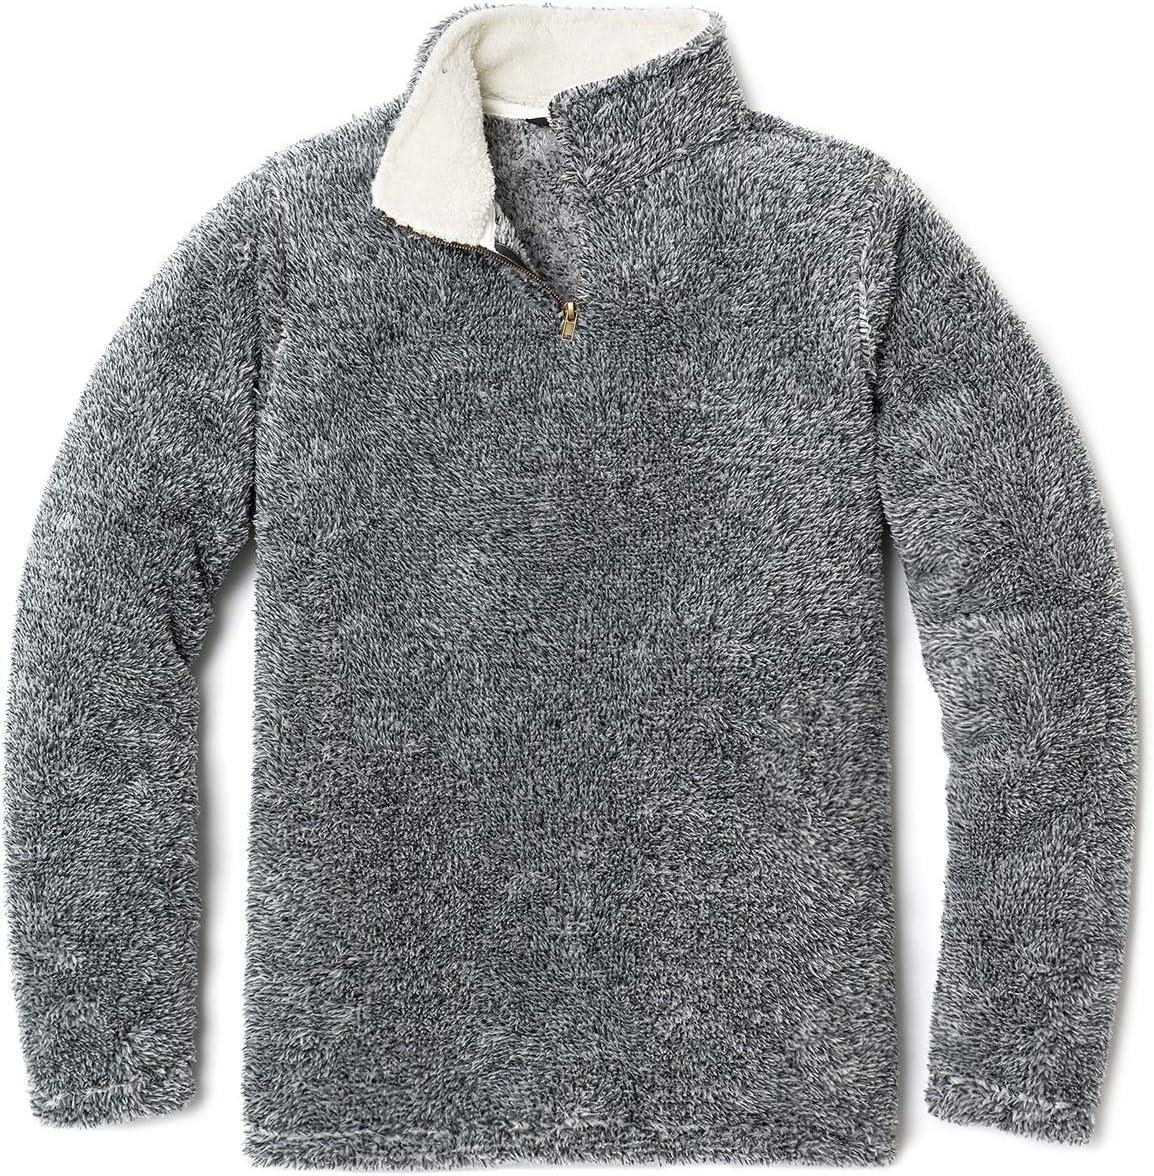 TSLA Womens Pullover Thermal Active Polar Fleece Sherpa Jacket